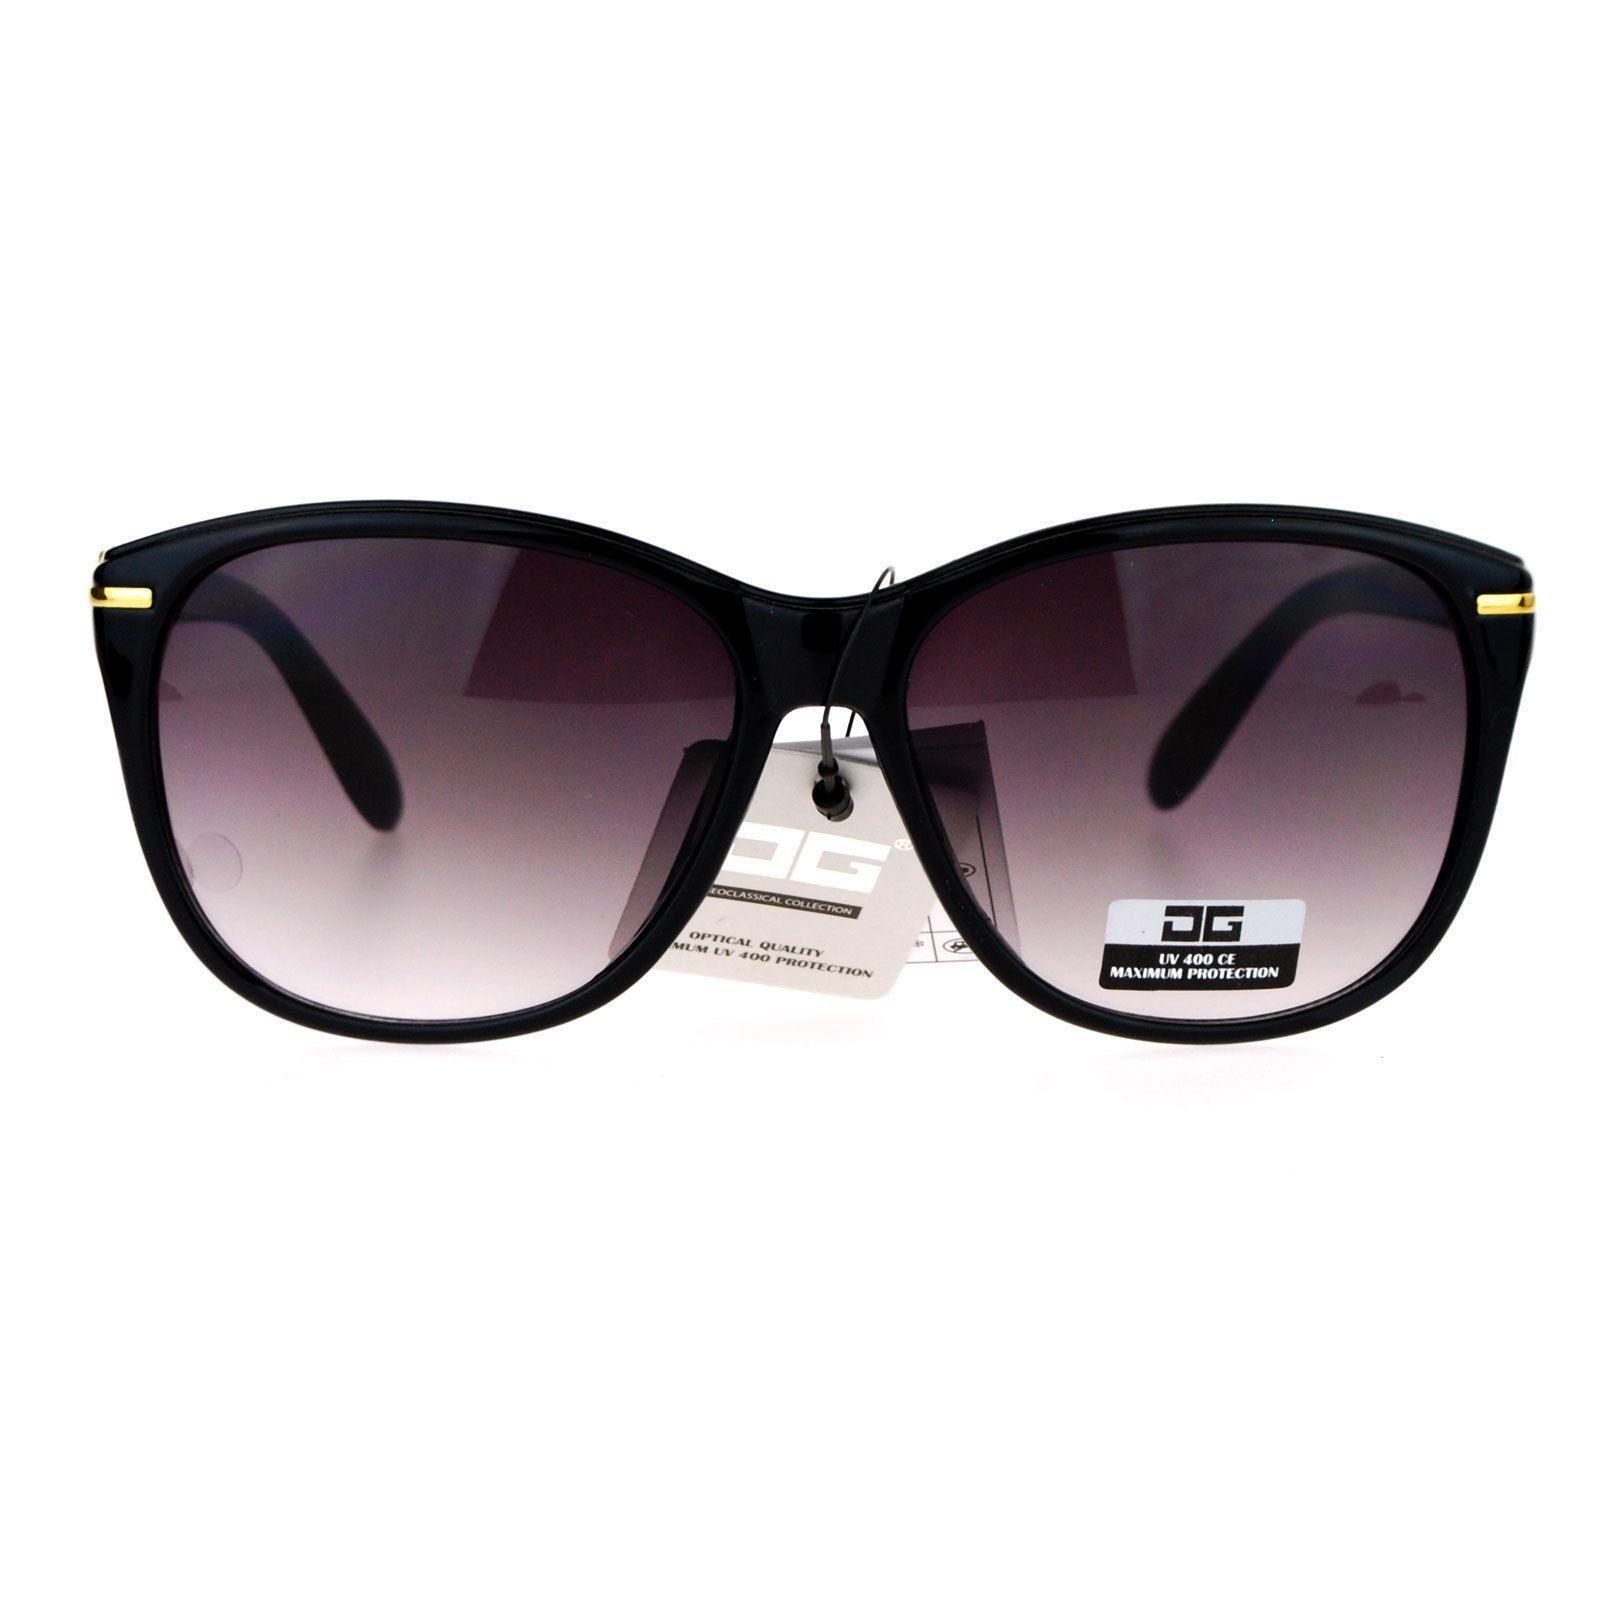 CG Eyewear Designer Fashion Women/'s Sunglasses Max UV Protection